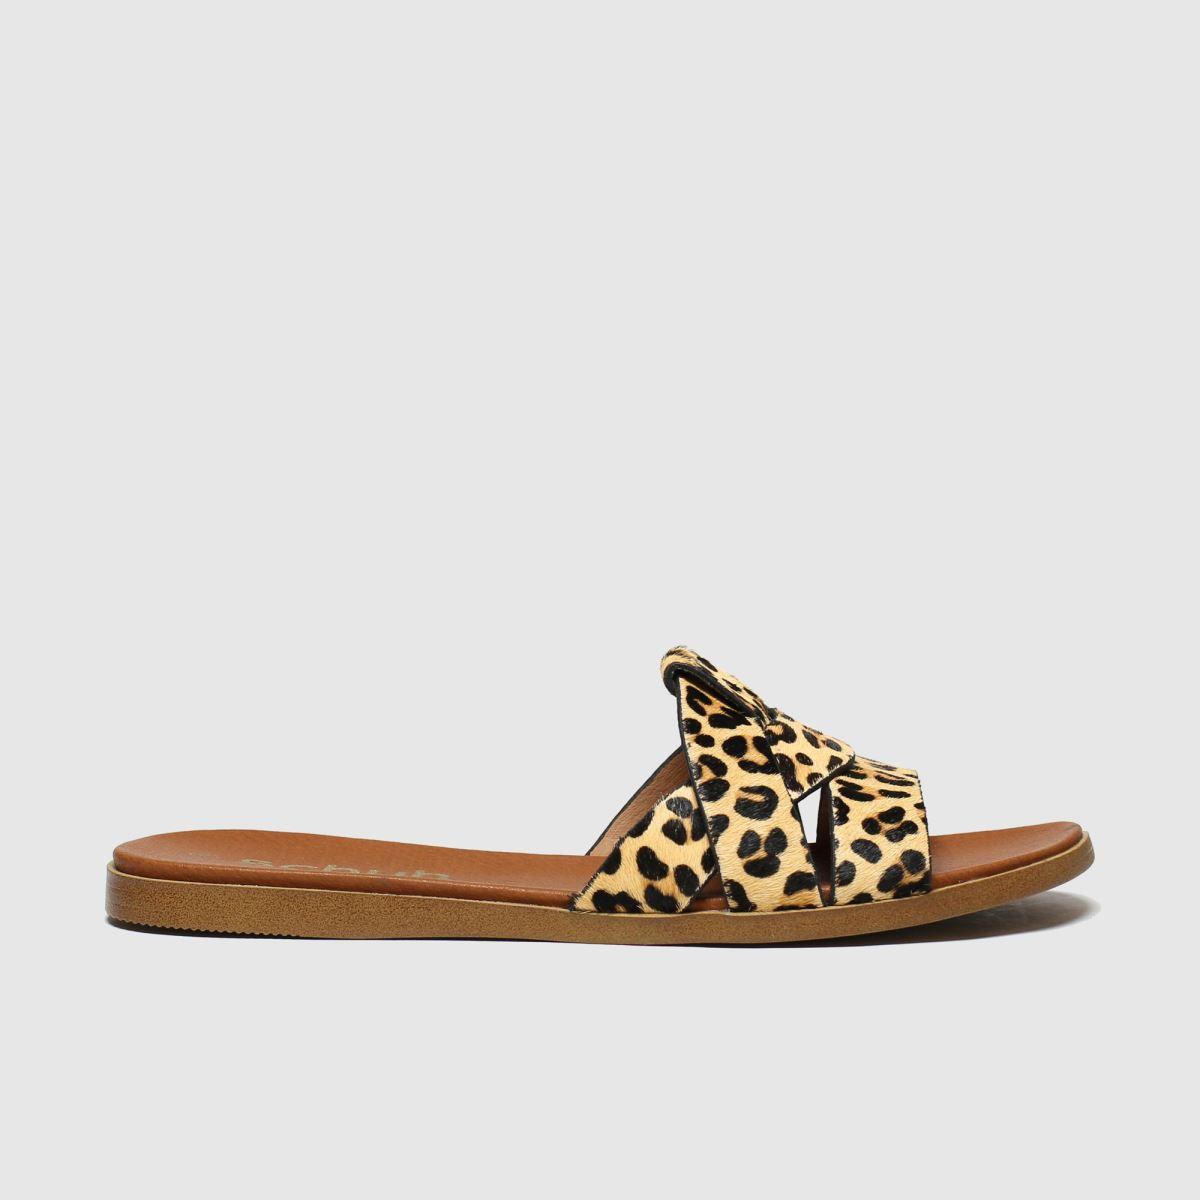 schuh Schuh Beige & Brown Geneva Sandals